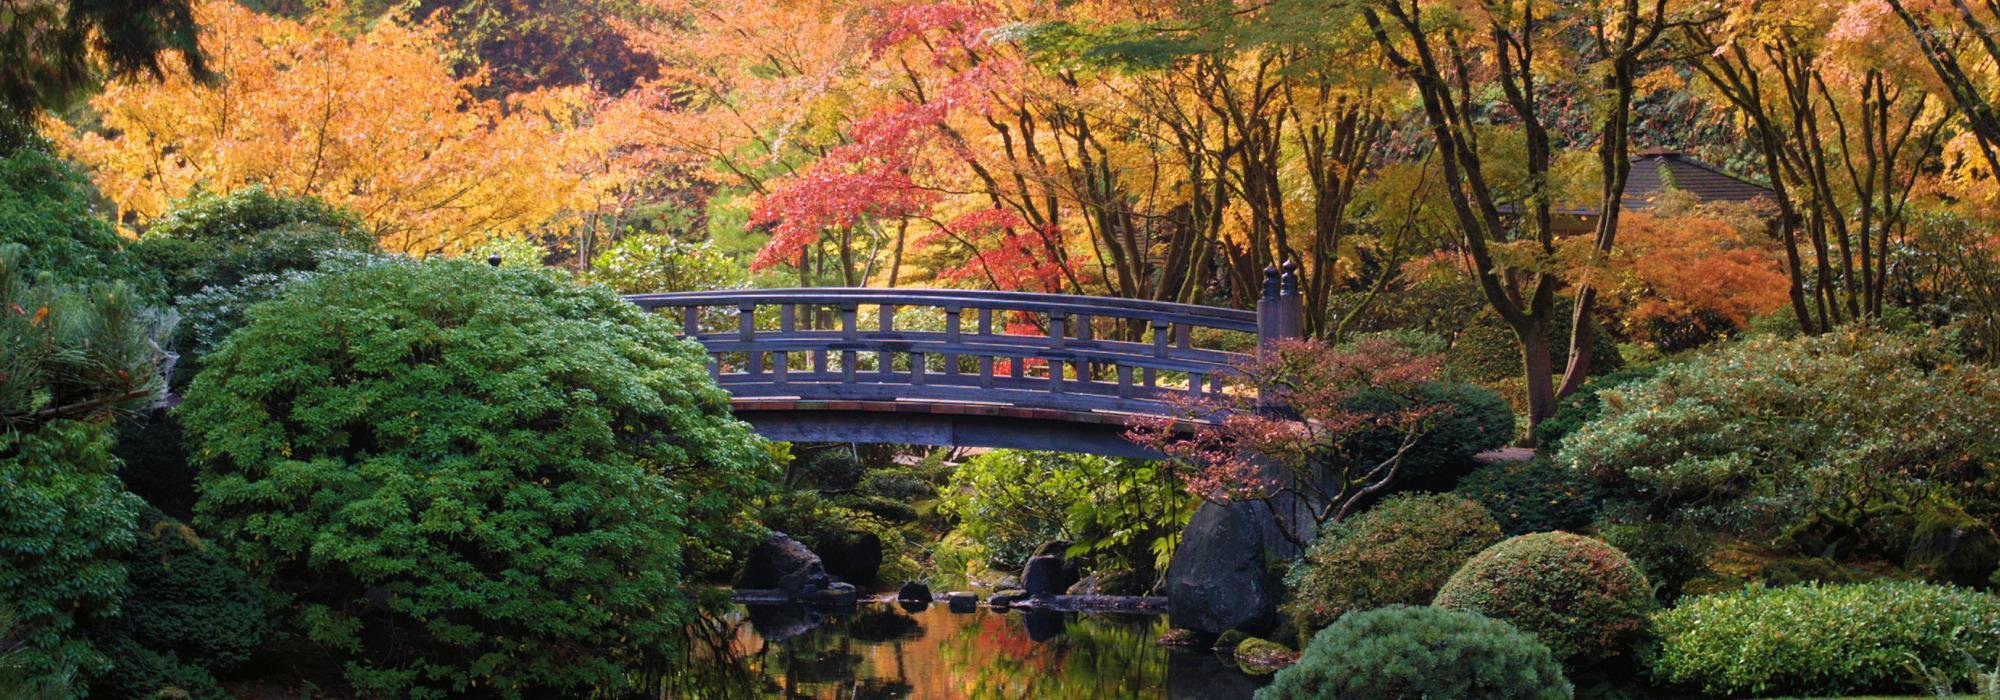 Portland Japanese Garden_Mike_Hiran_2007_hero.jpg